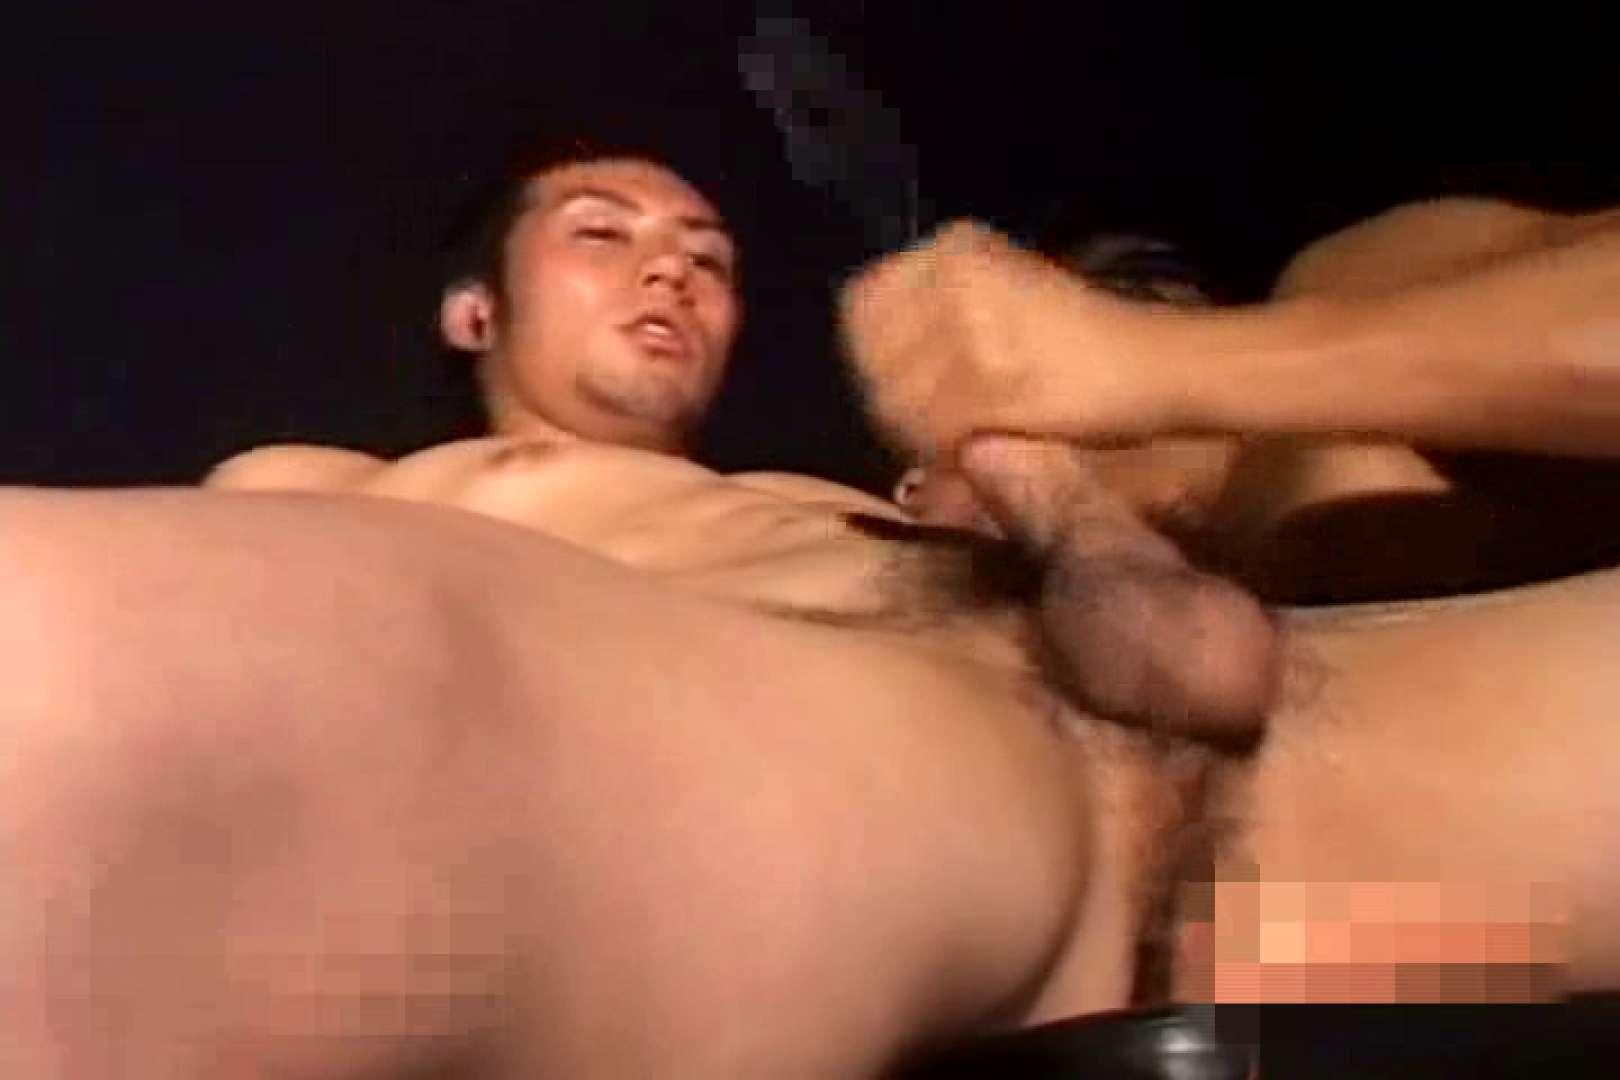 Beautiful muscle モッコリ野郎達!Vol.04 フェラDE絶頂 | イケメンのsex  103pic 9